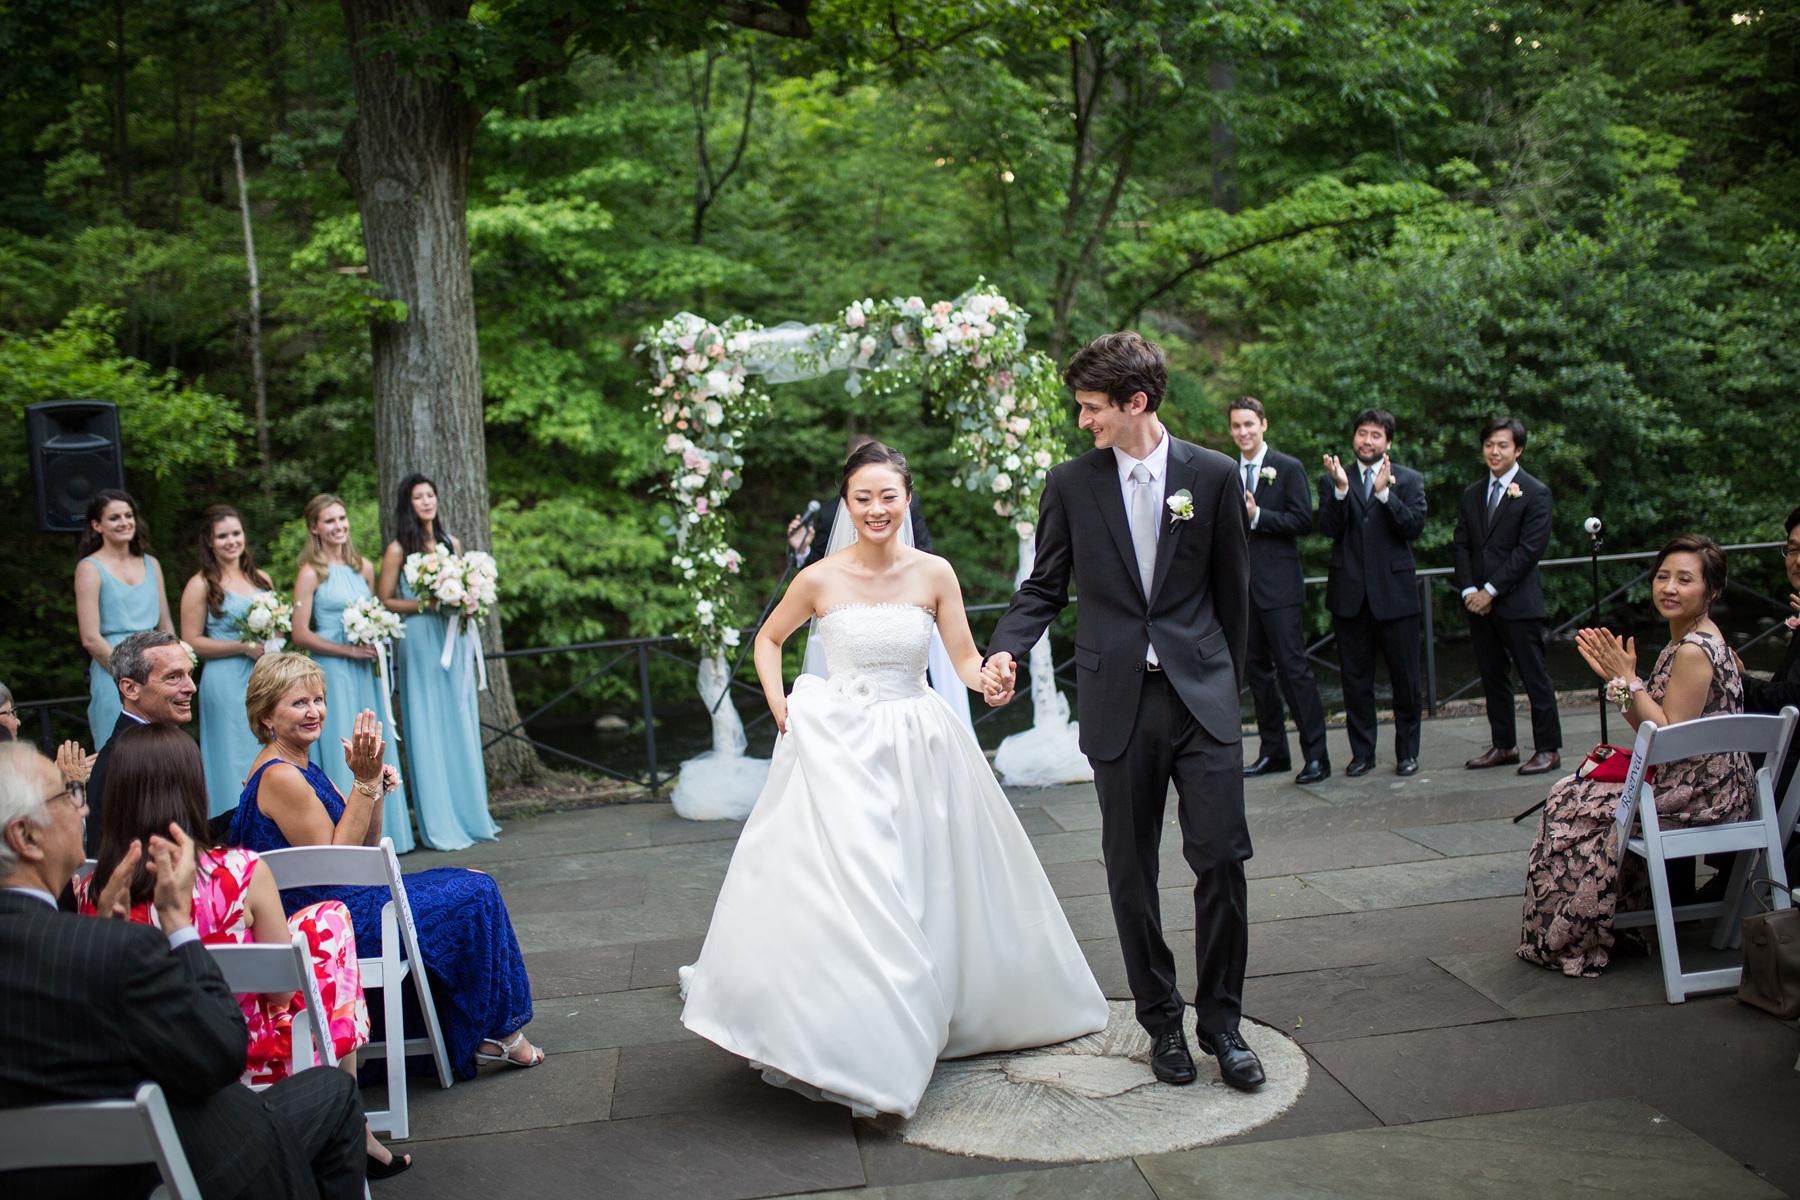 New York Botanical Garden Wedding.New York Botanical Garden Wedding Stone Mill 42 Modern Wedding